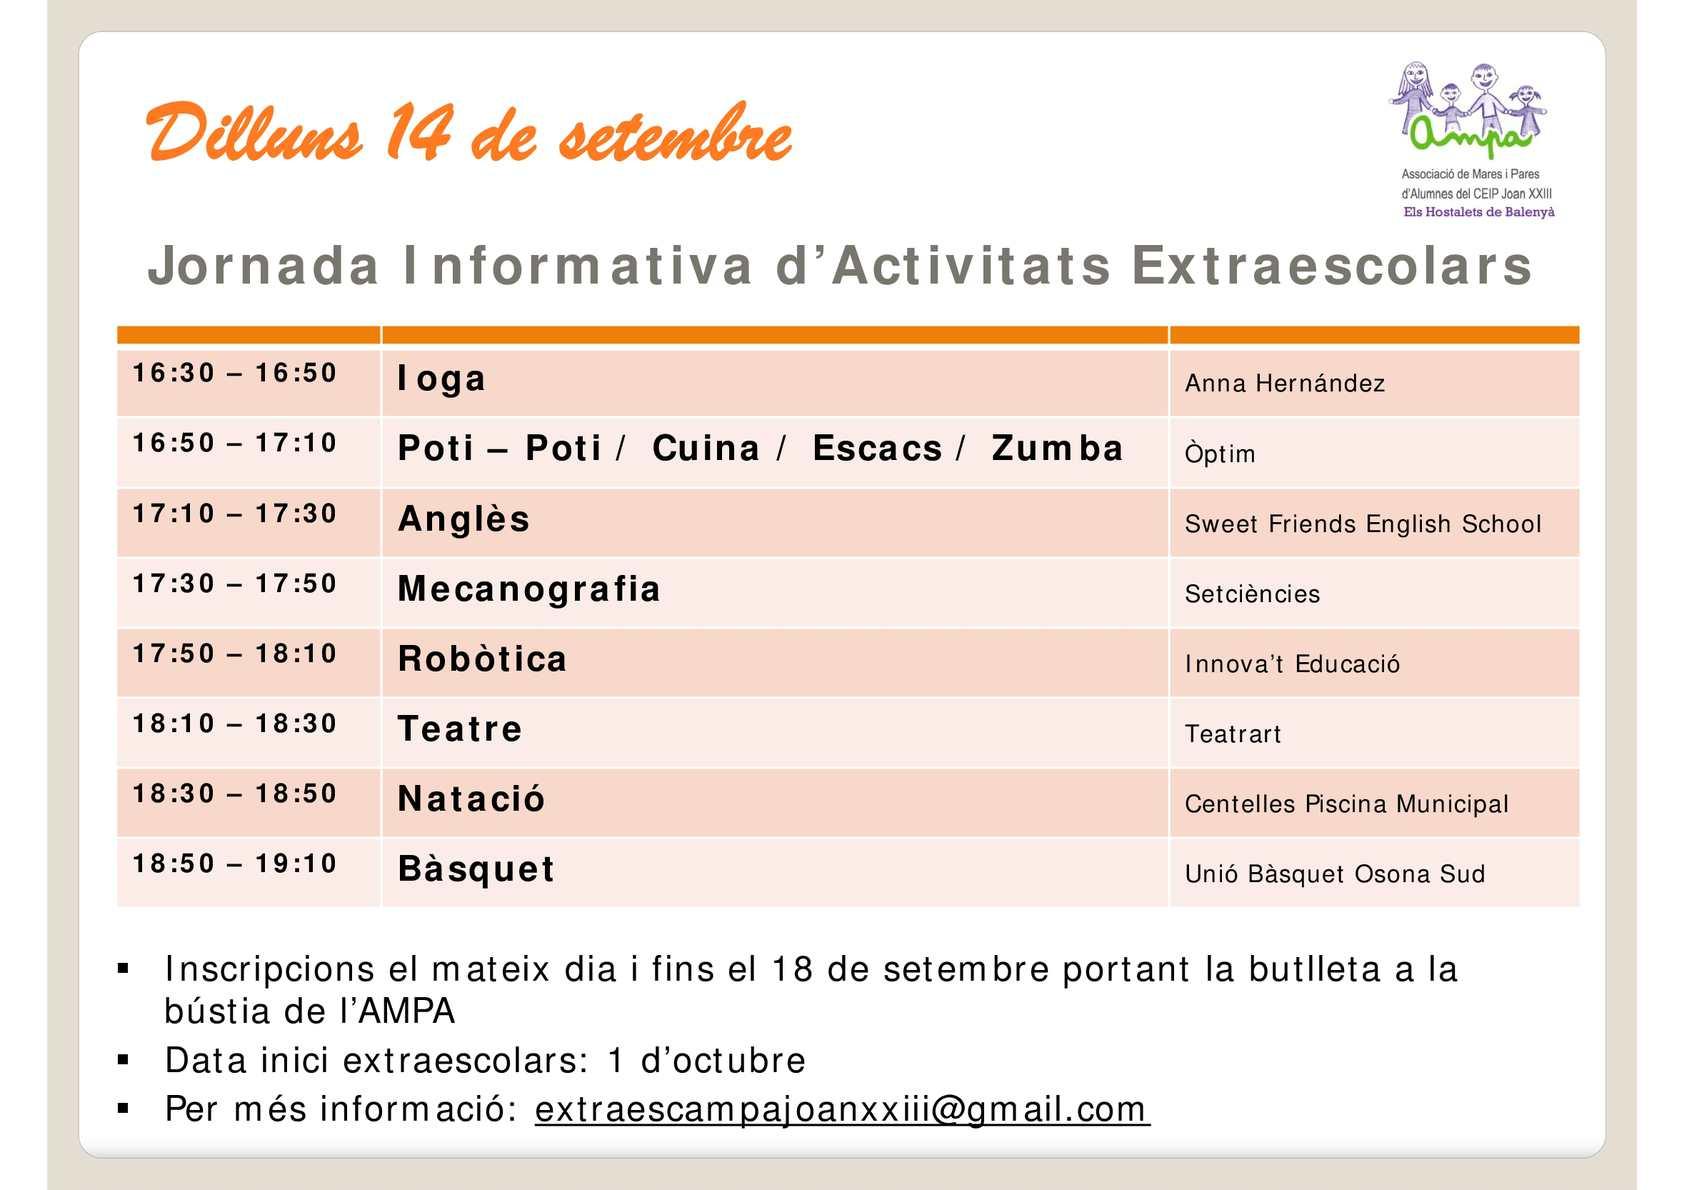 Calam o cartell jornada extraescolars 1 for Piscina municipal centelles